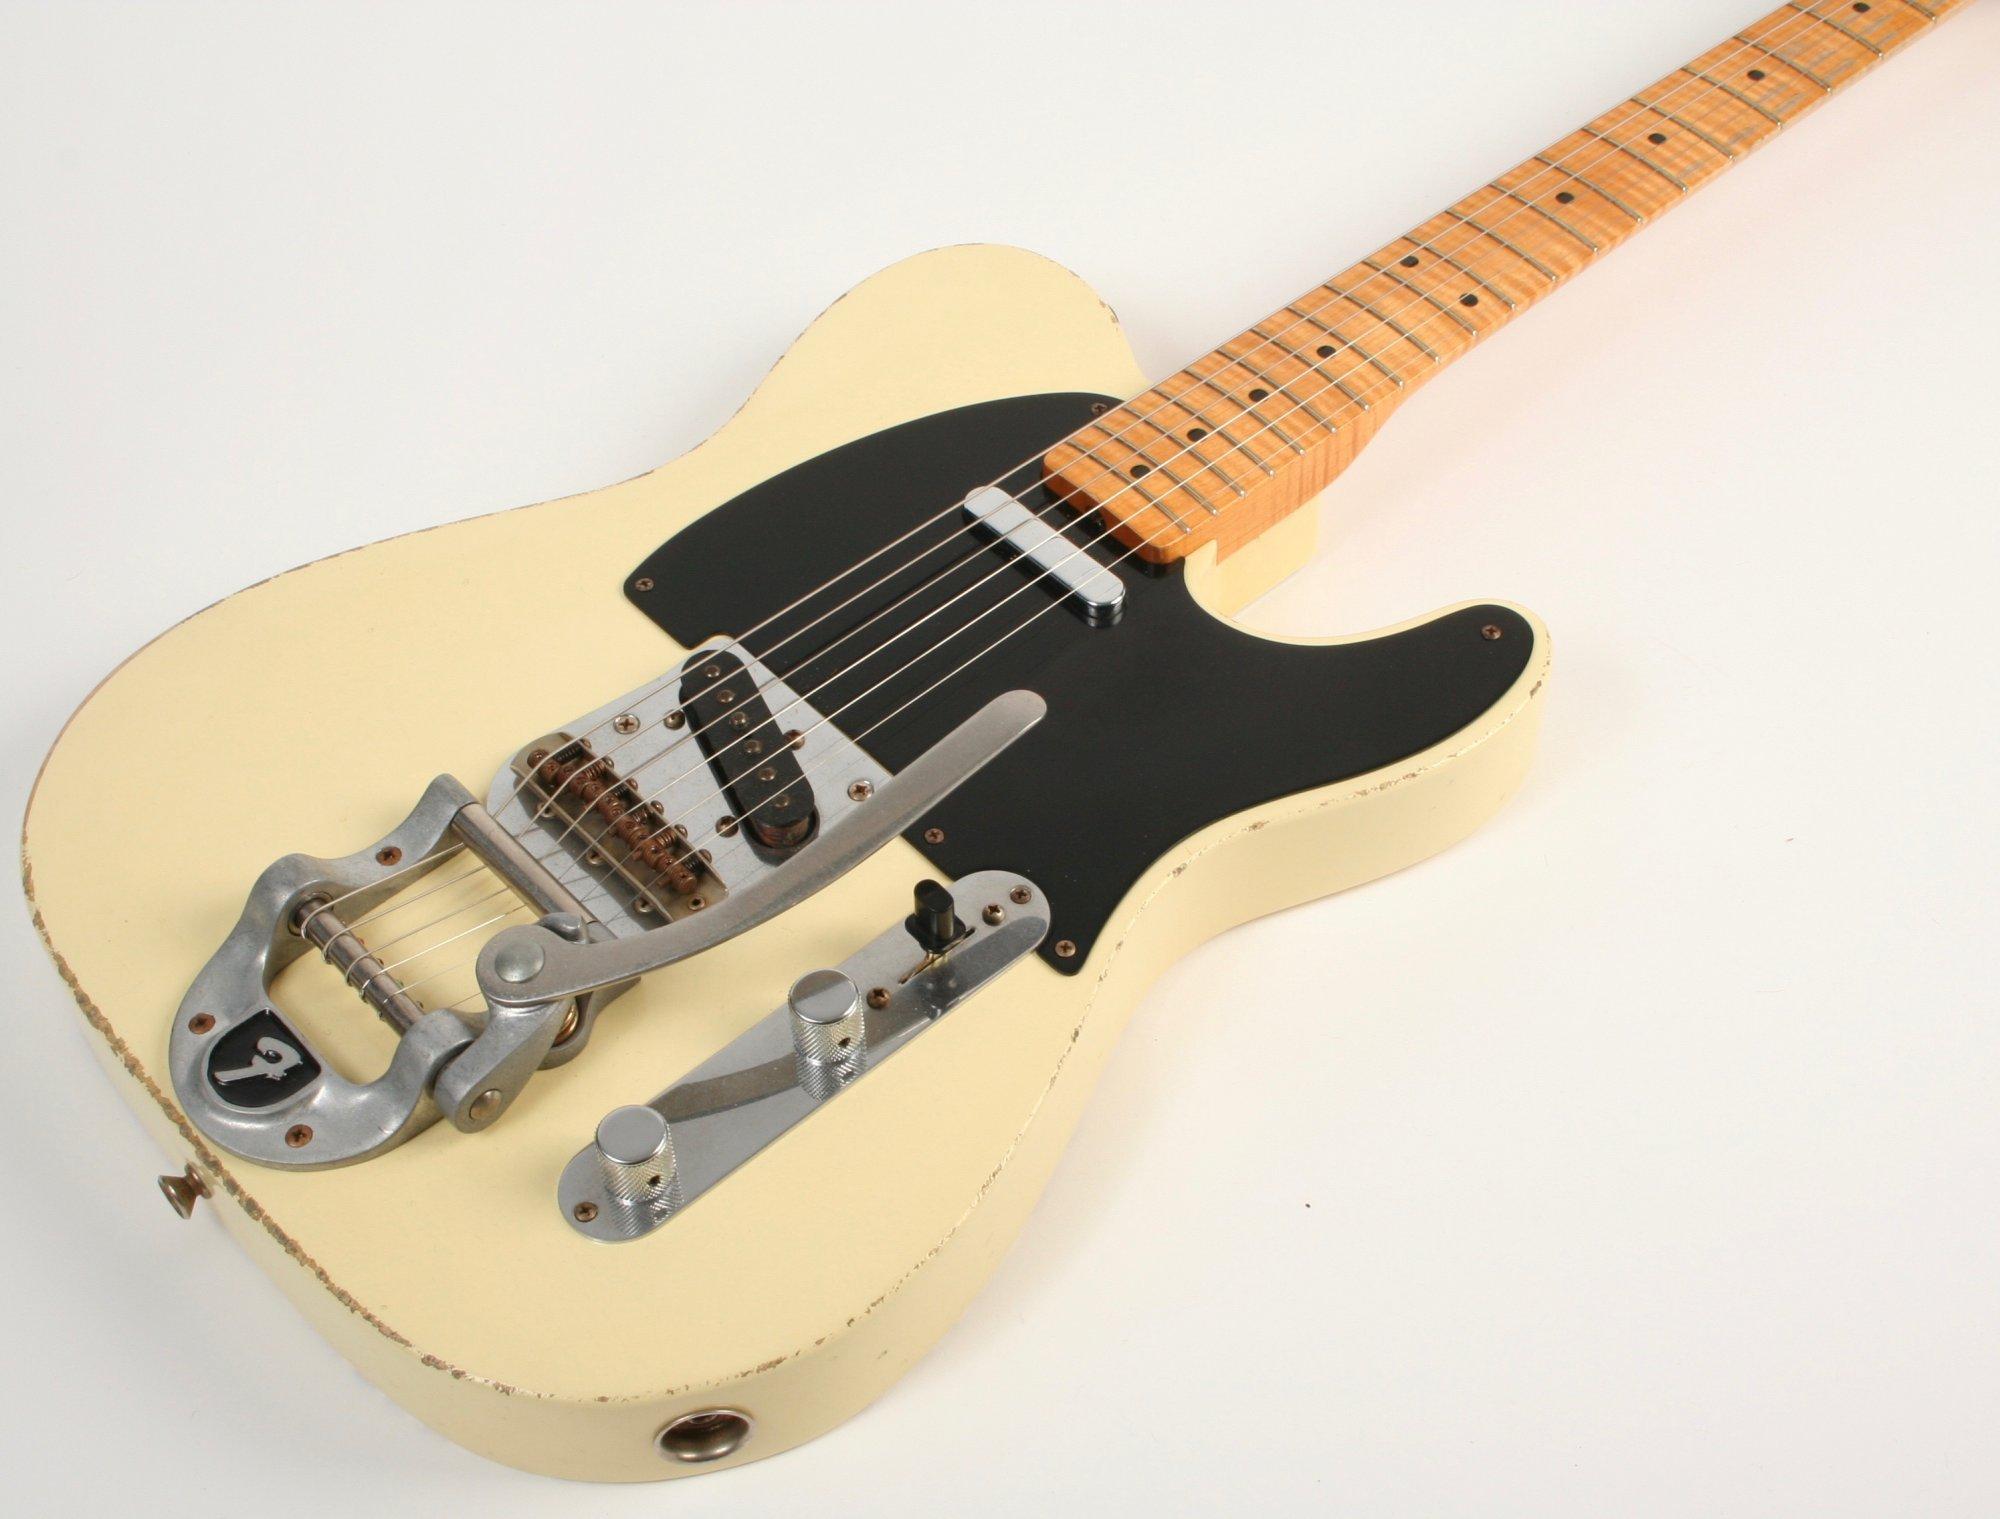 Fender Custom Shop '63 Telecaster Master Built Yuriy Shishkov 2005